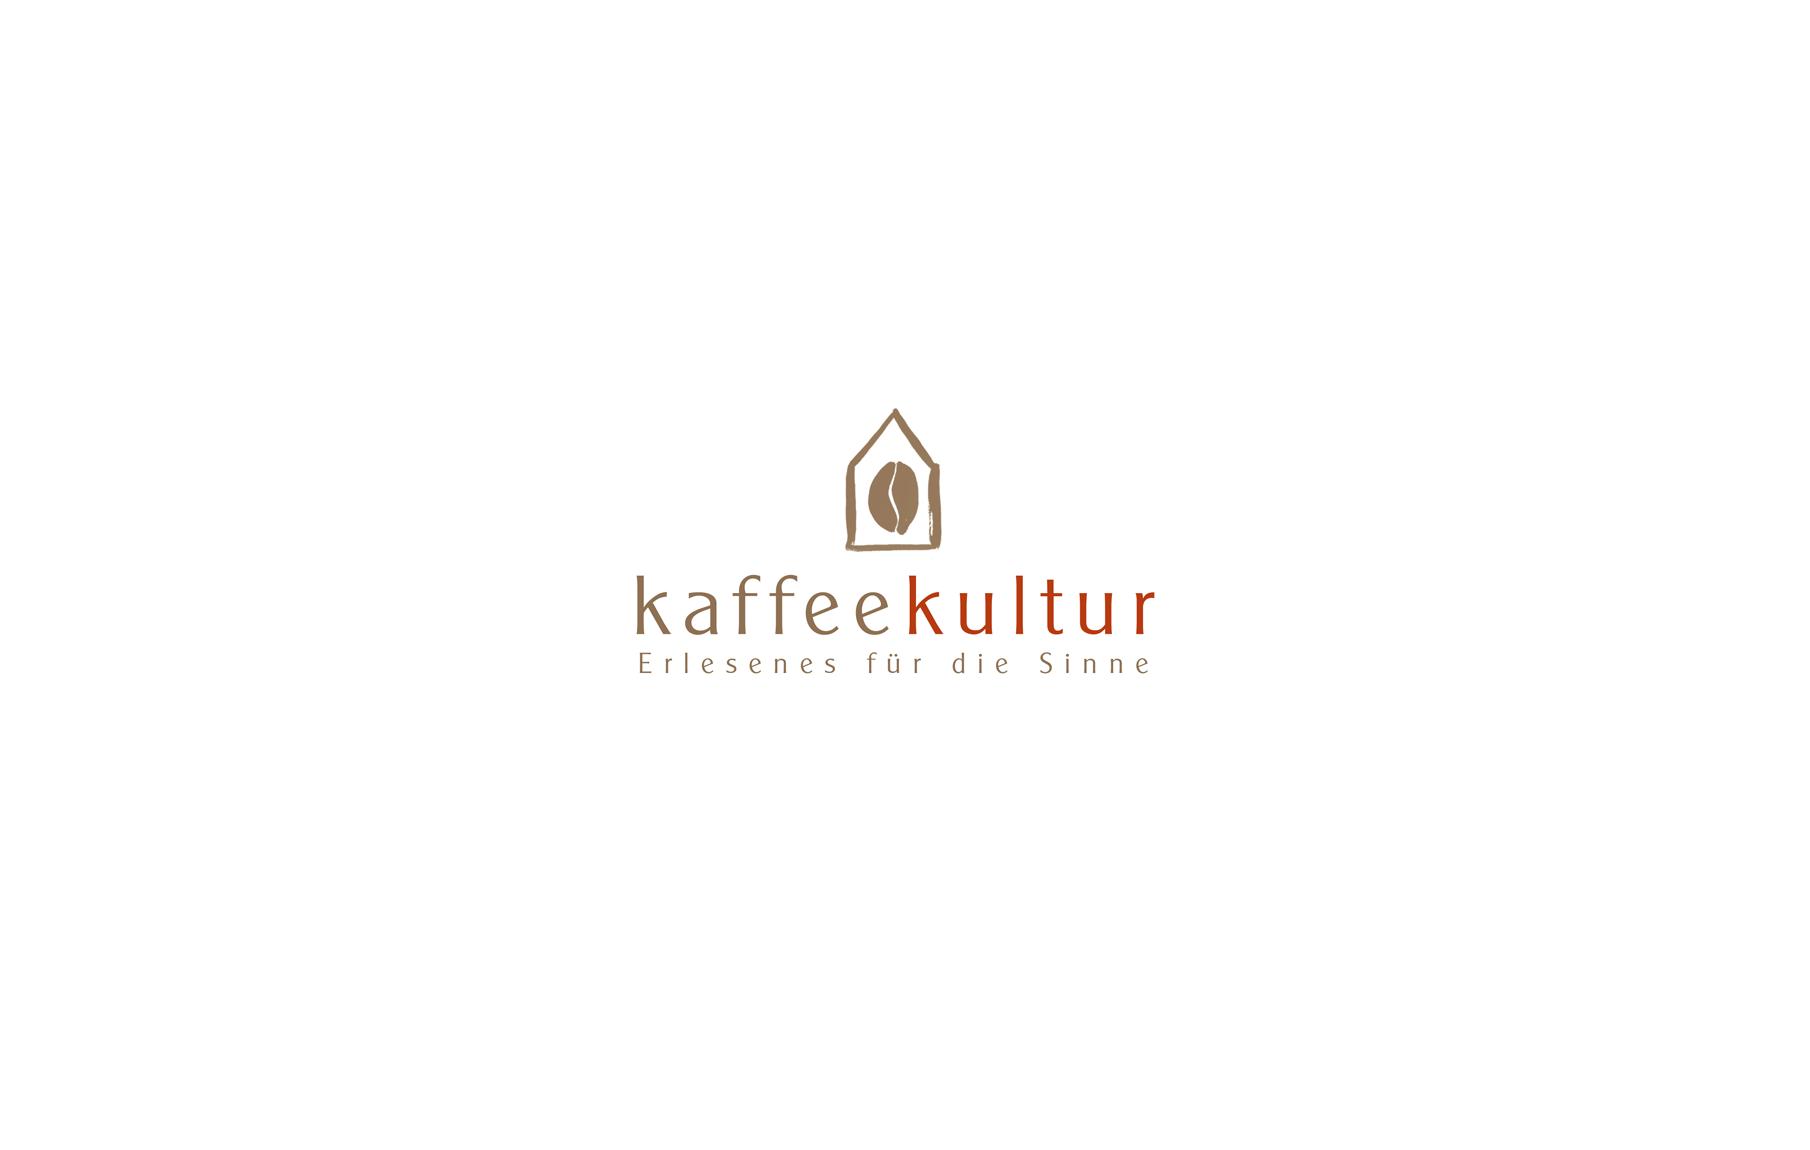 TKR_Logoentwurf_03